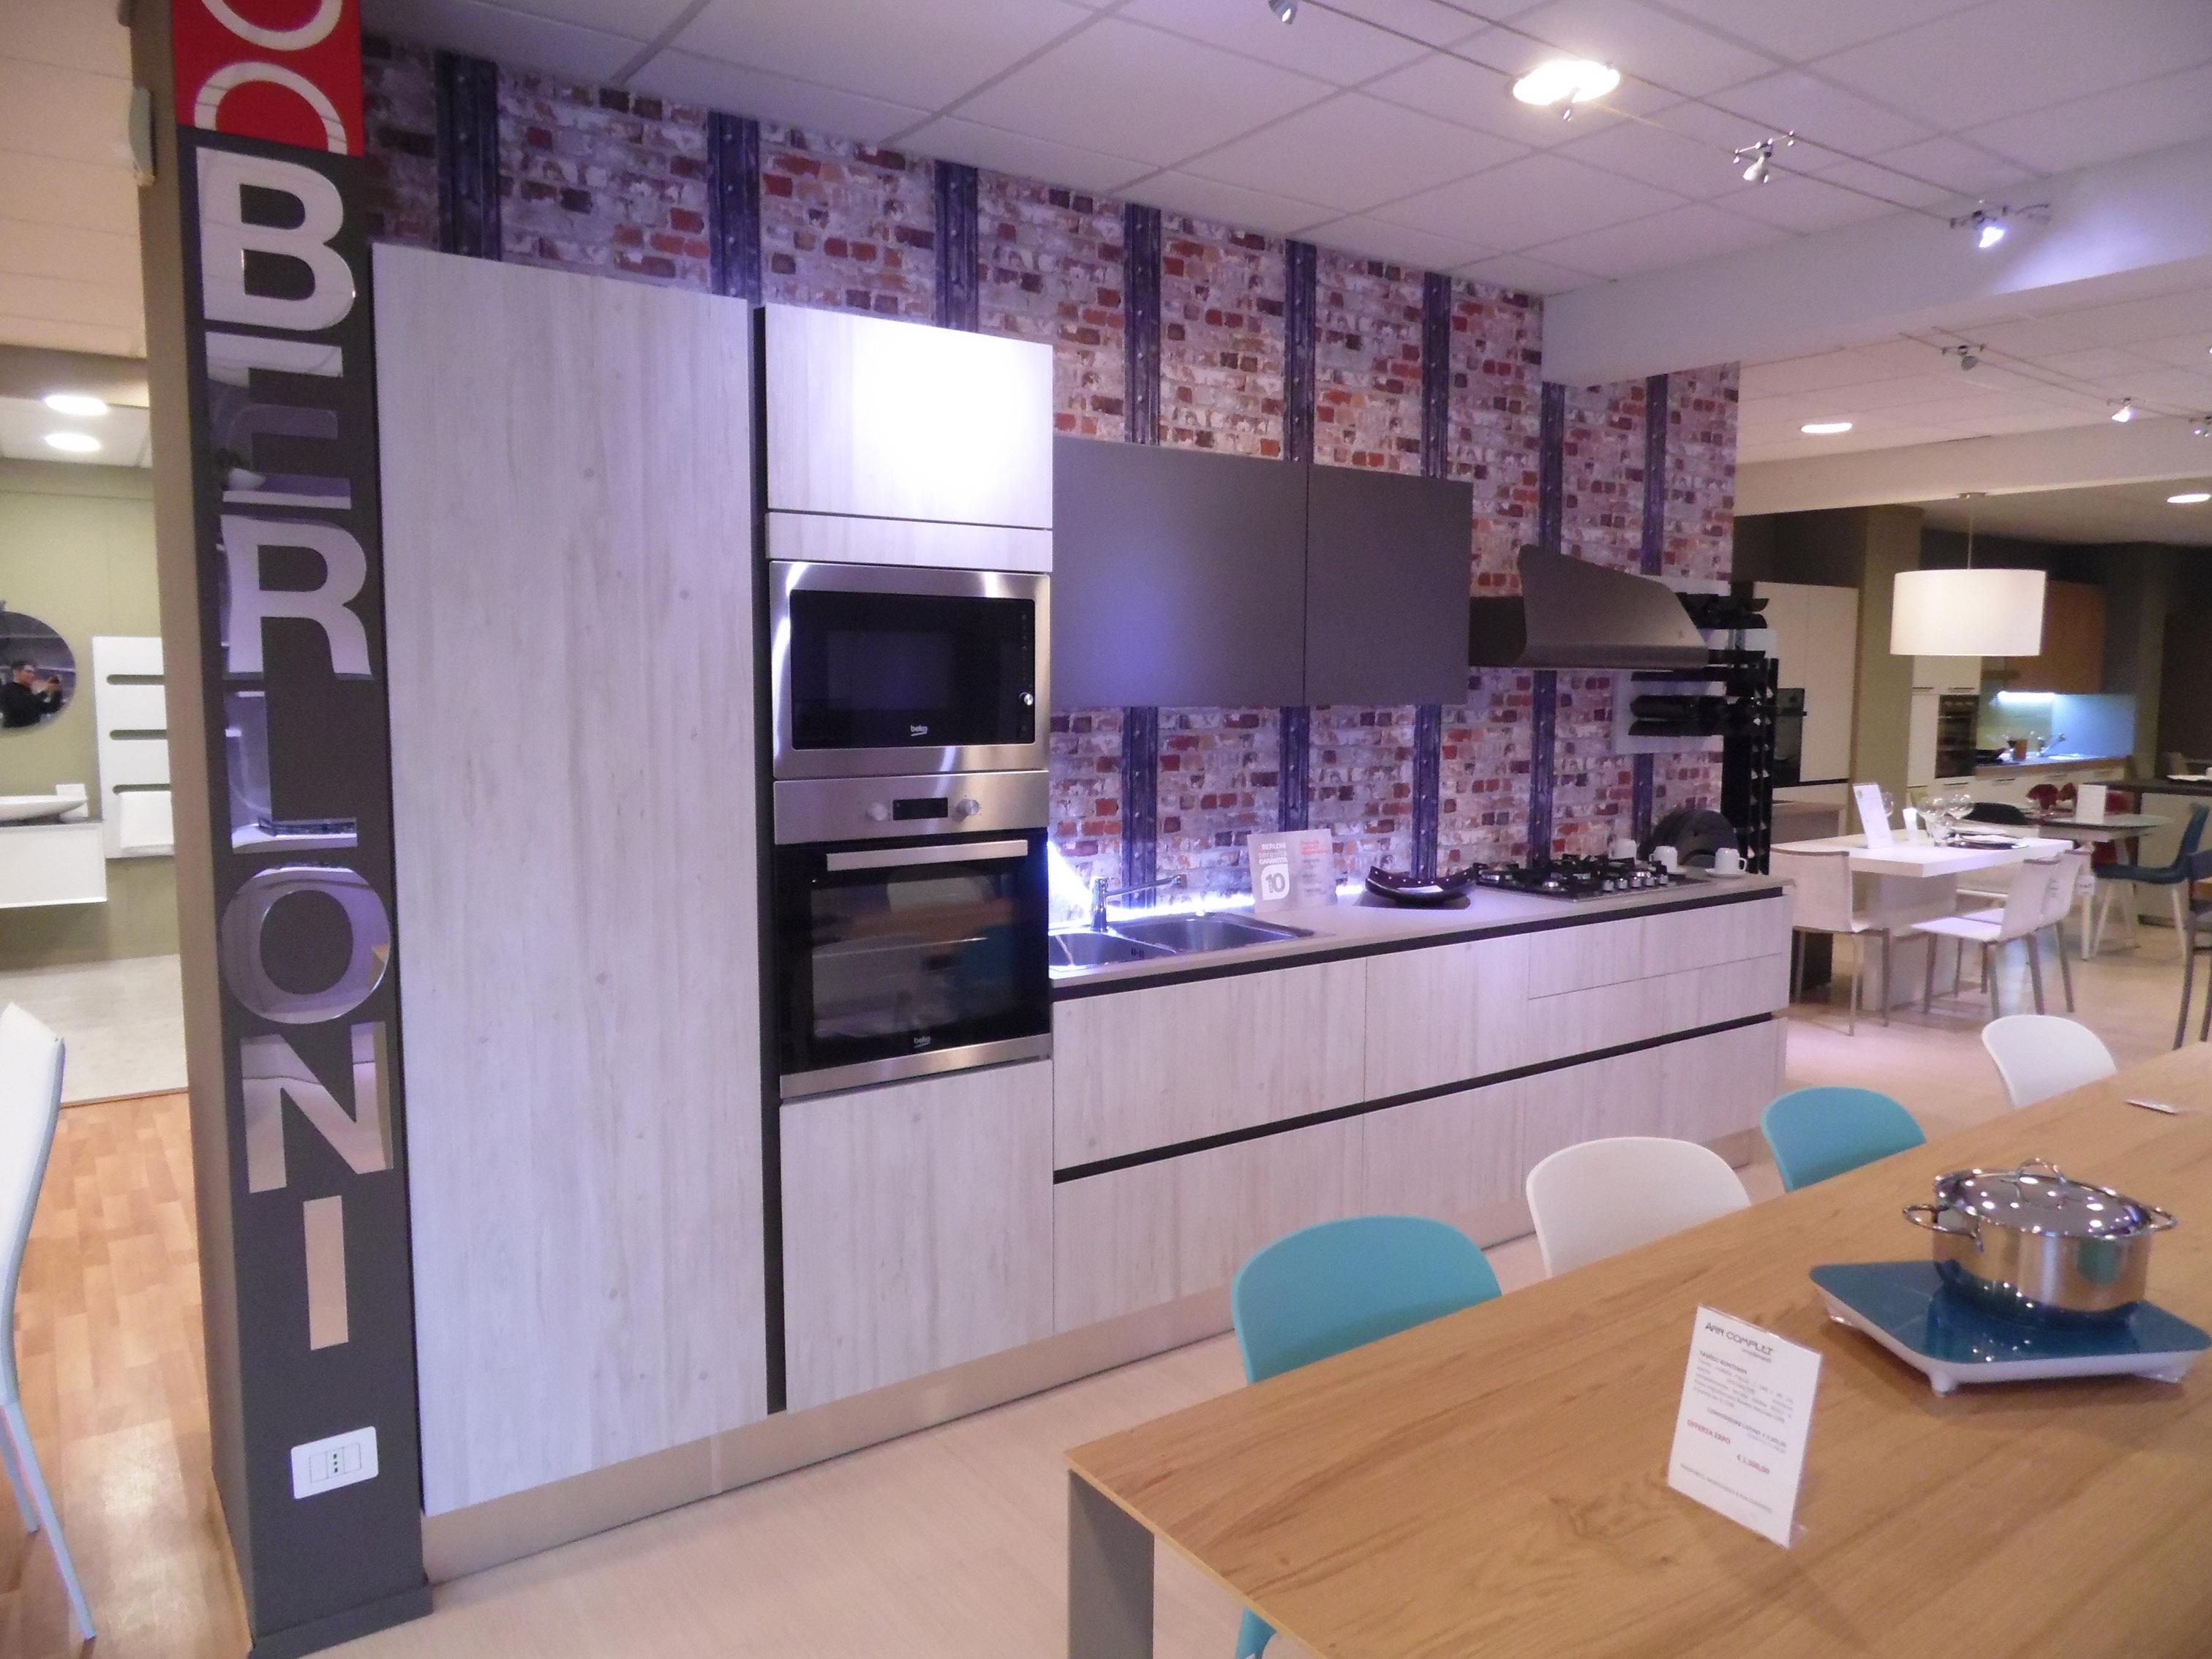 Beautiful cucina berloni b50 gallery home ideas - Prezzo cucine berloni ...